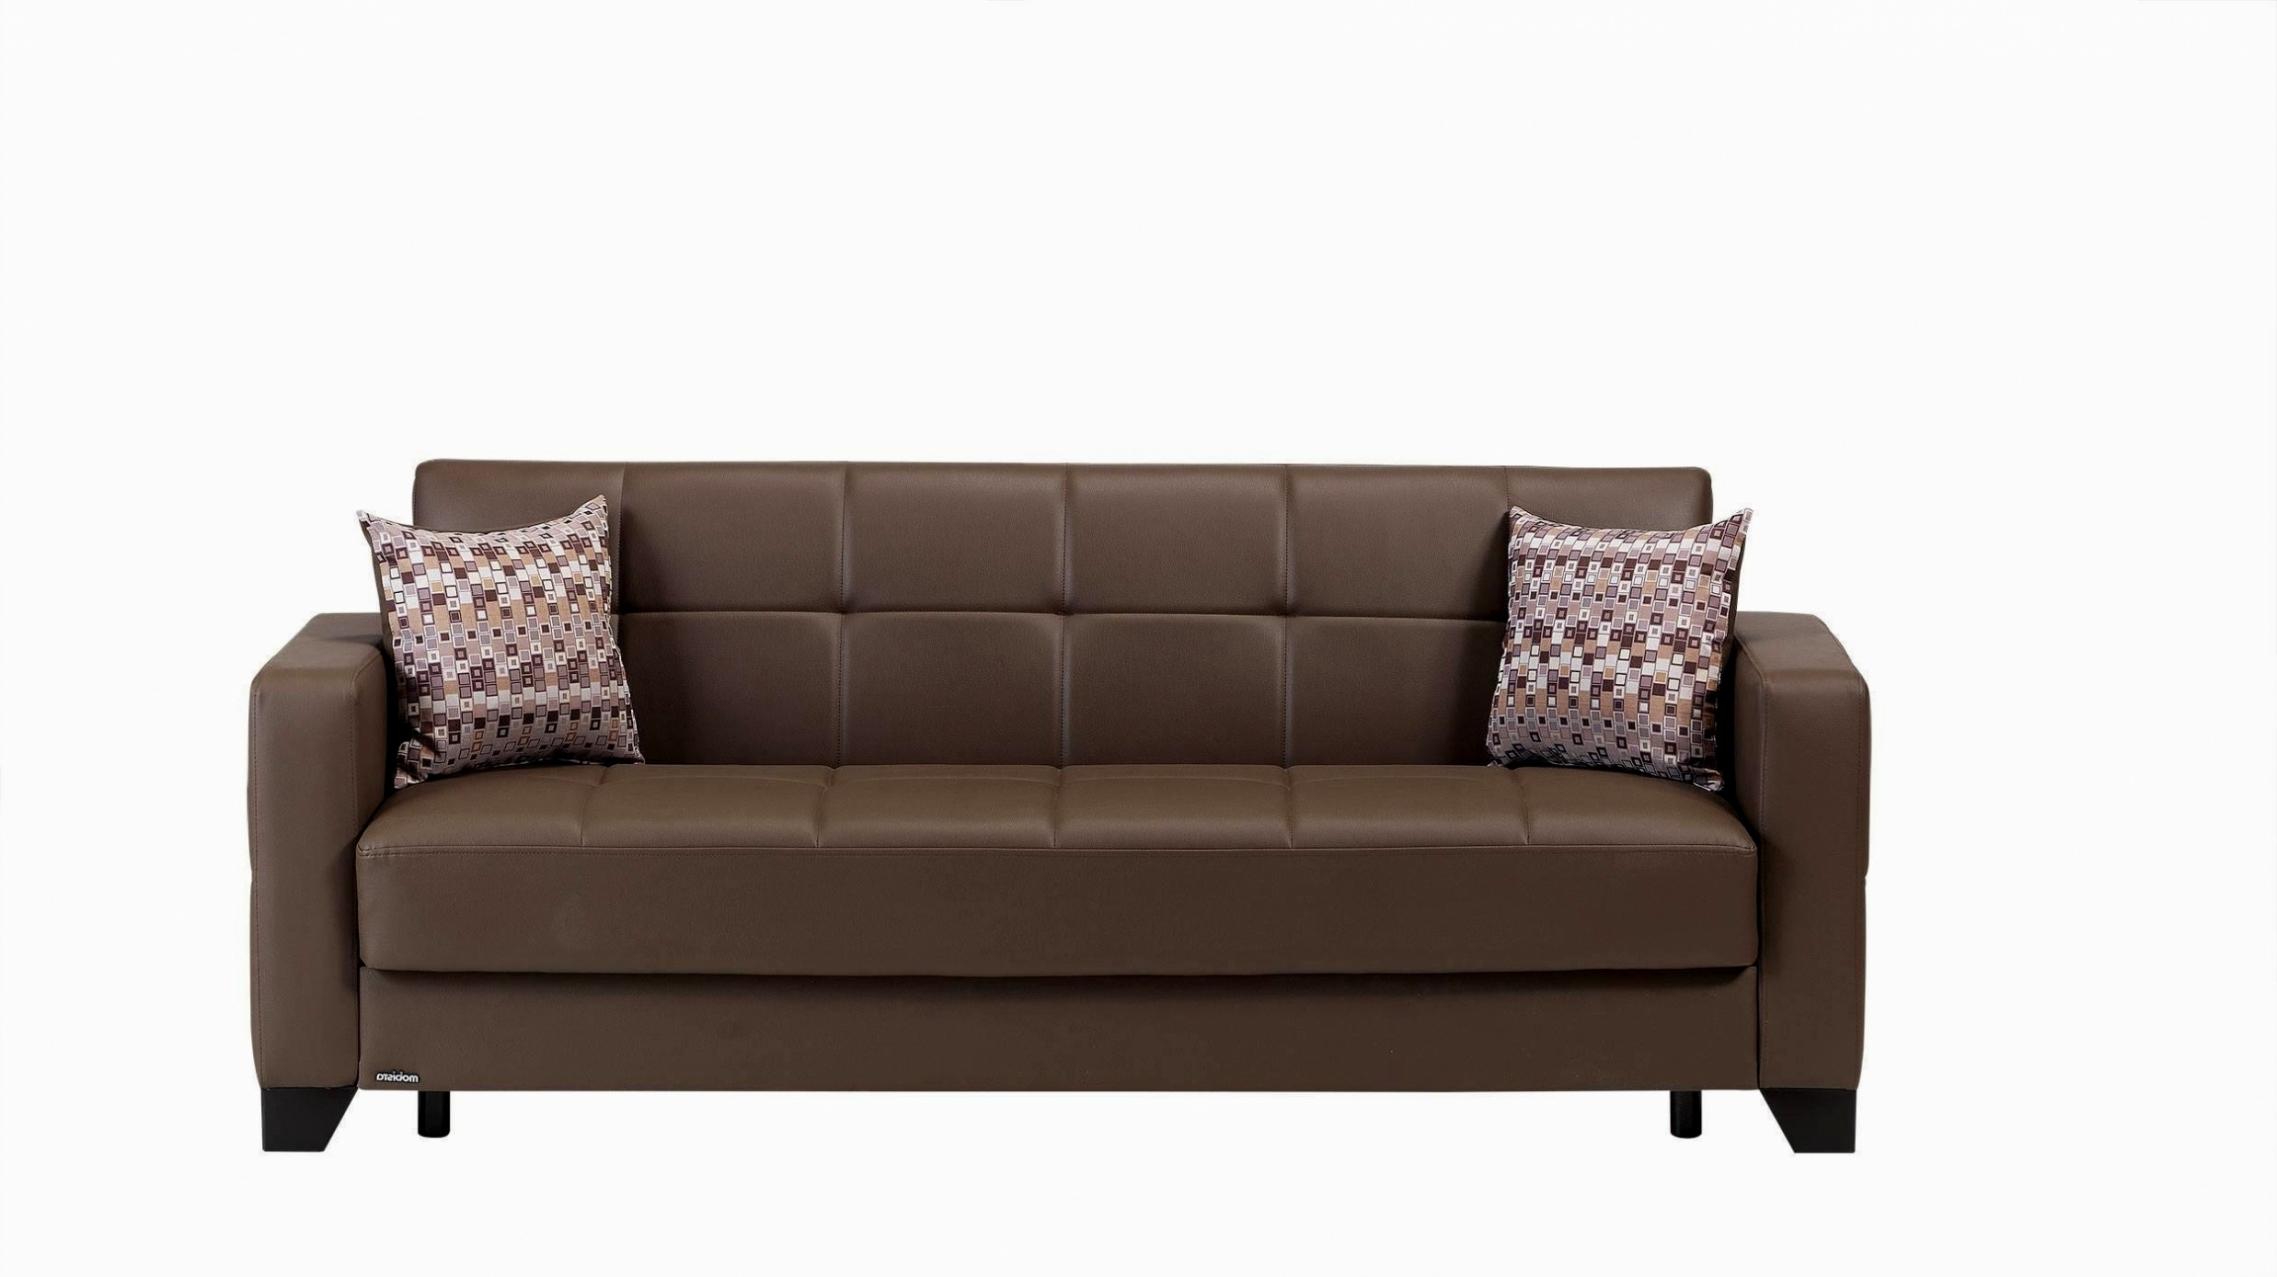 Sofas Santander Drdp Blend Mantas De sofa Blendiberia Psicologiaymediacion sofas En